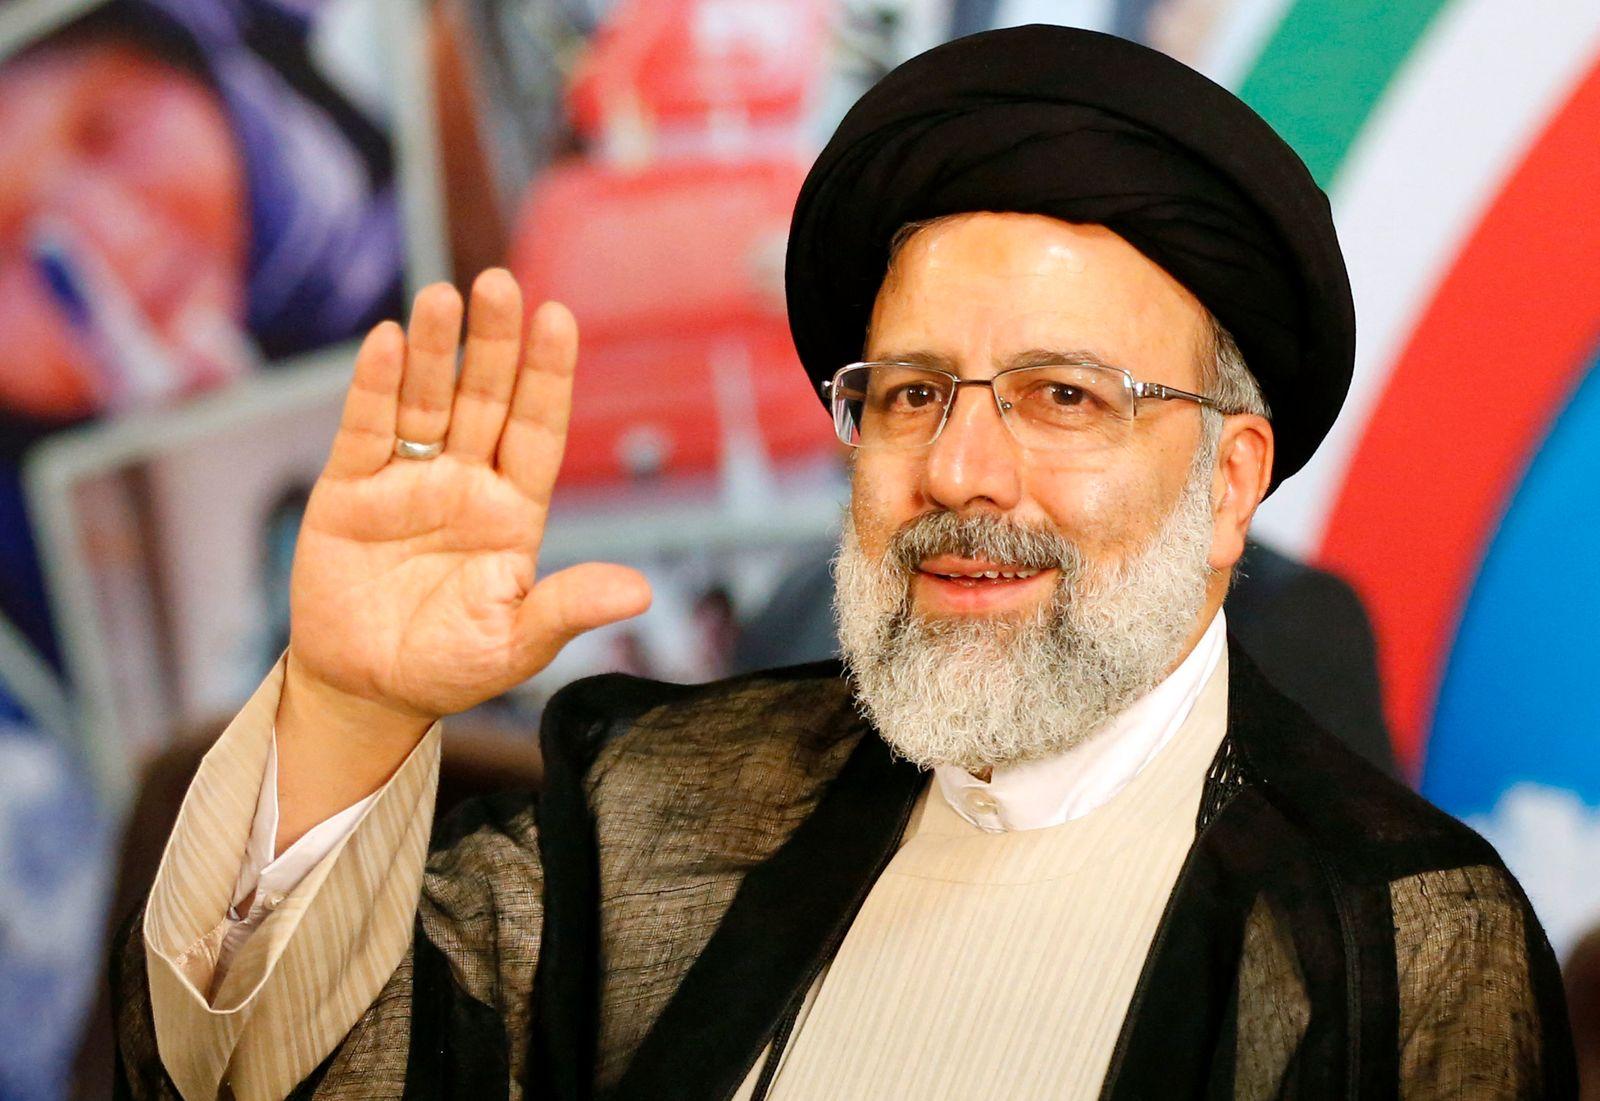 FILES-IRAN-POLITICS-VOTE-RAISI